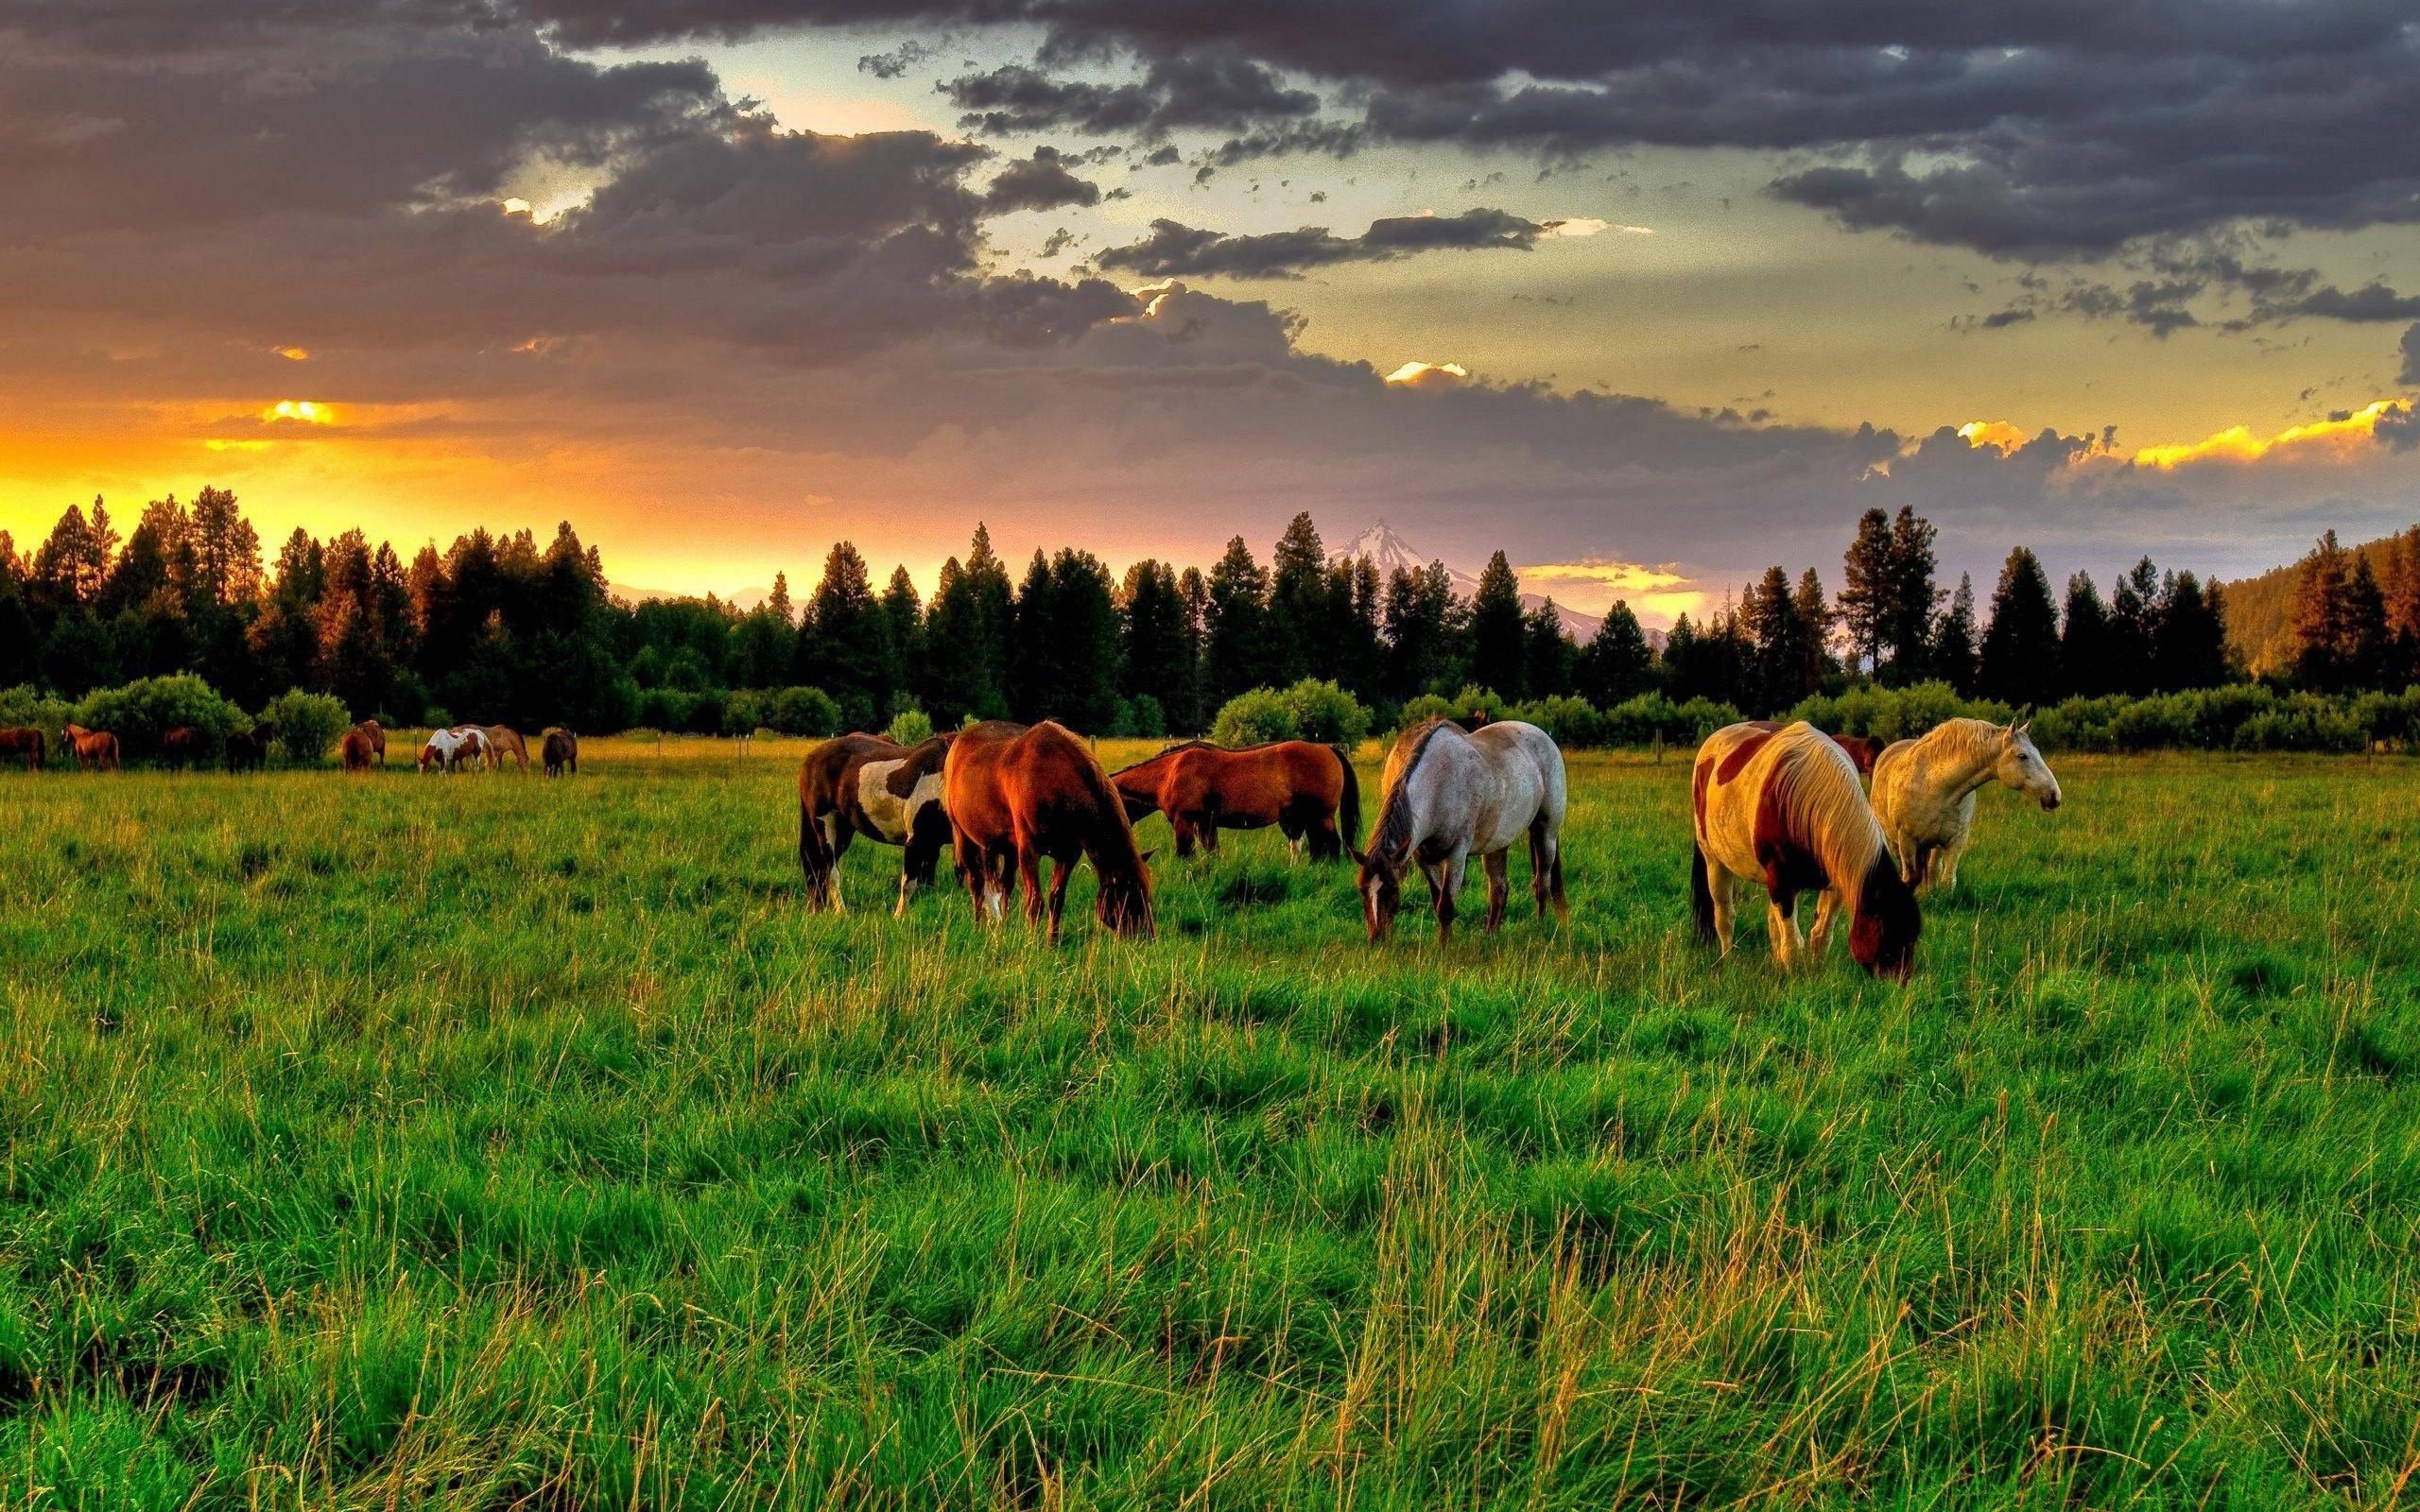 Horse Desktop Backgrounds 2560x1600